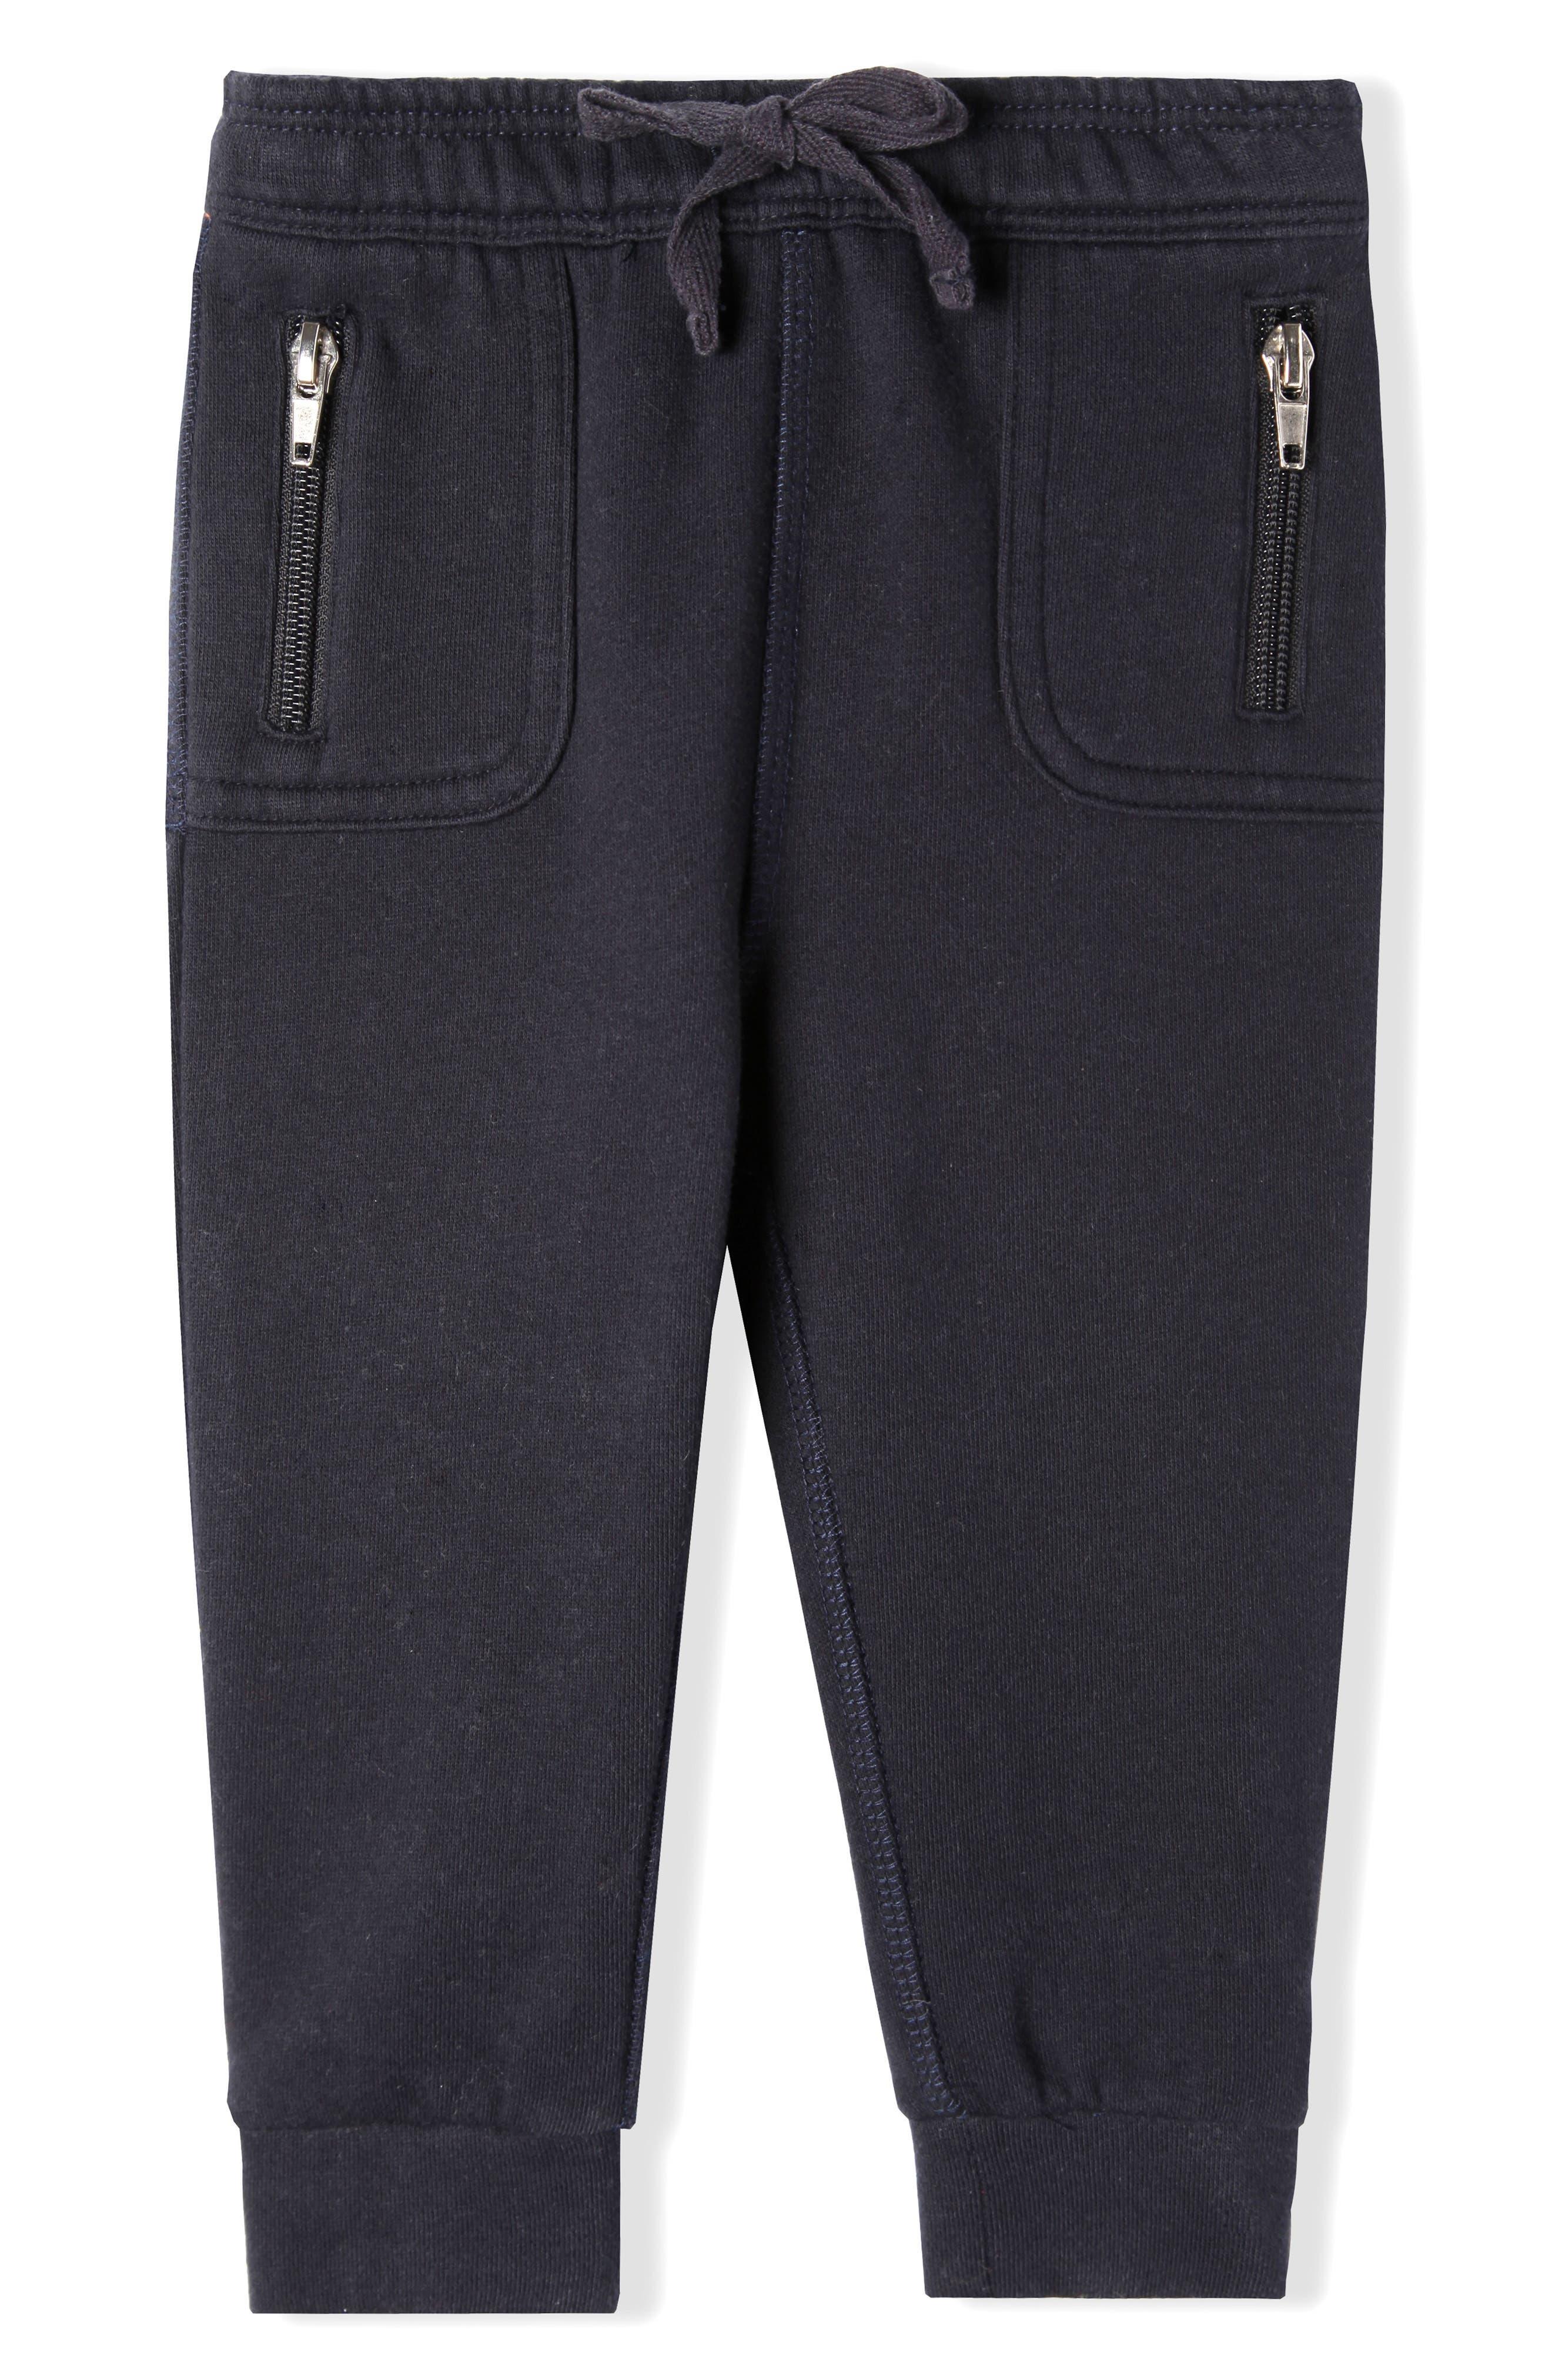 Art & Eden Mercer Organic Cotton Jogger Pants (Baby)